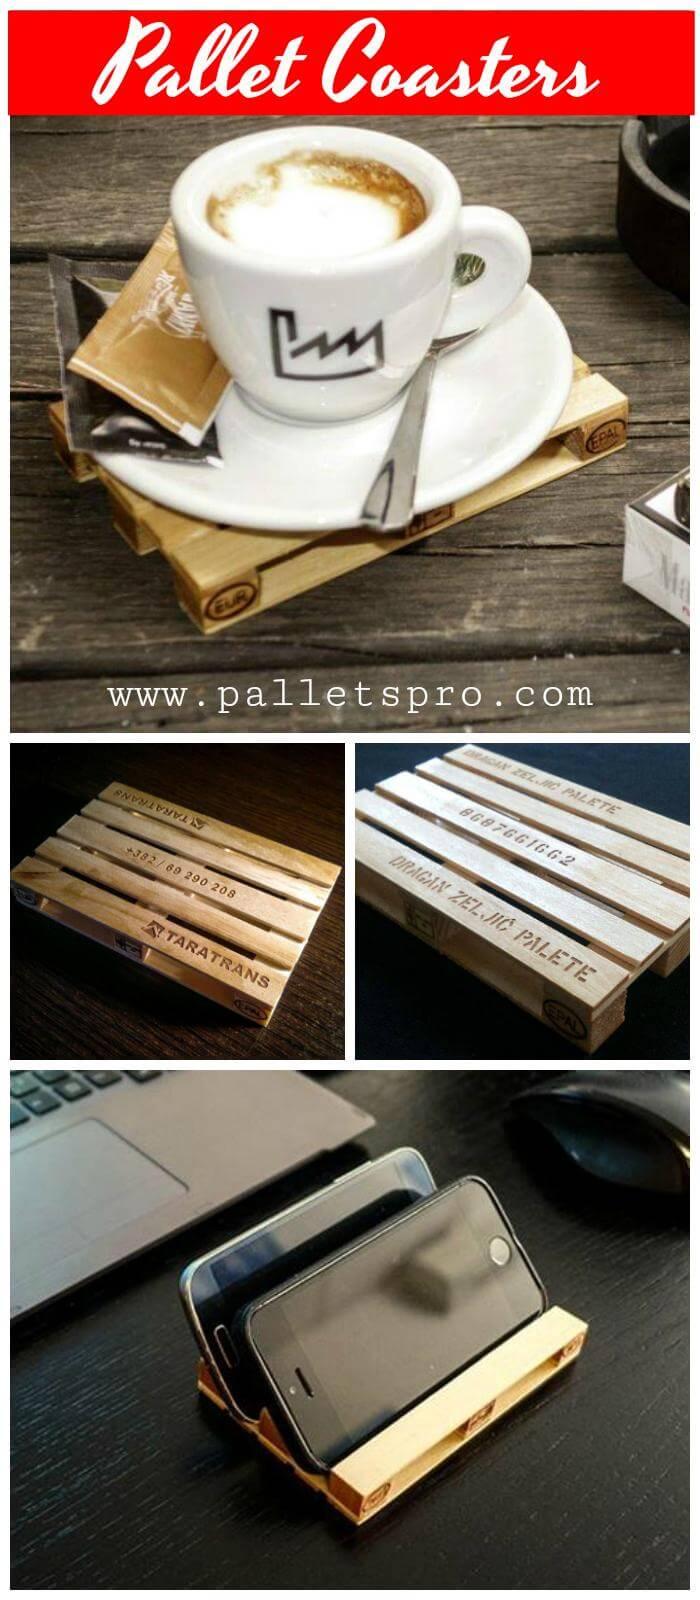 Pallet Coasters